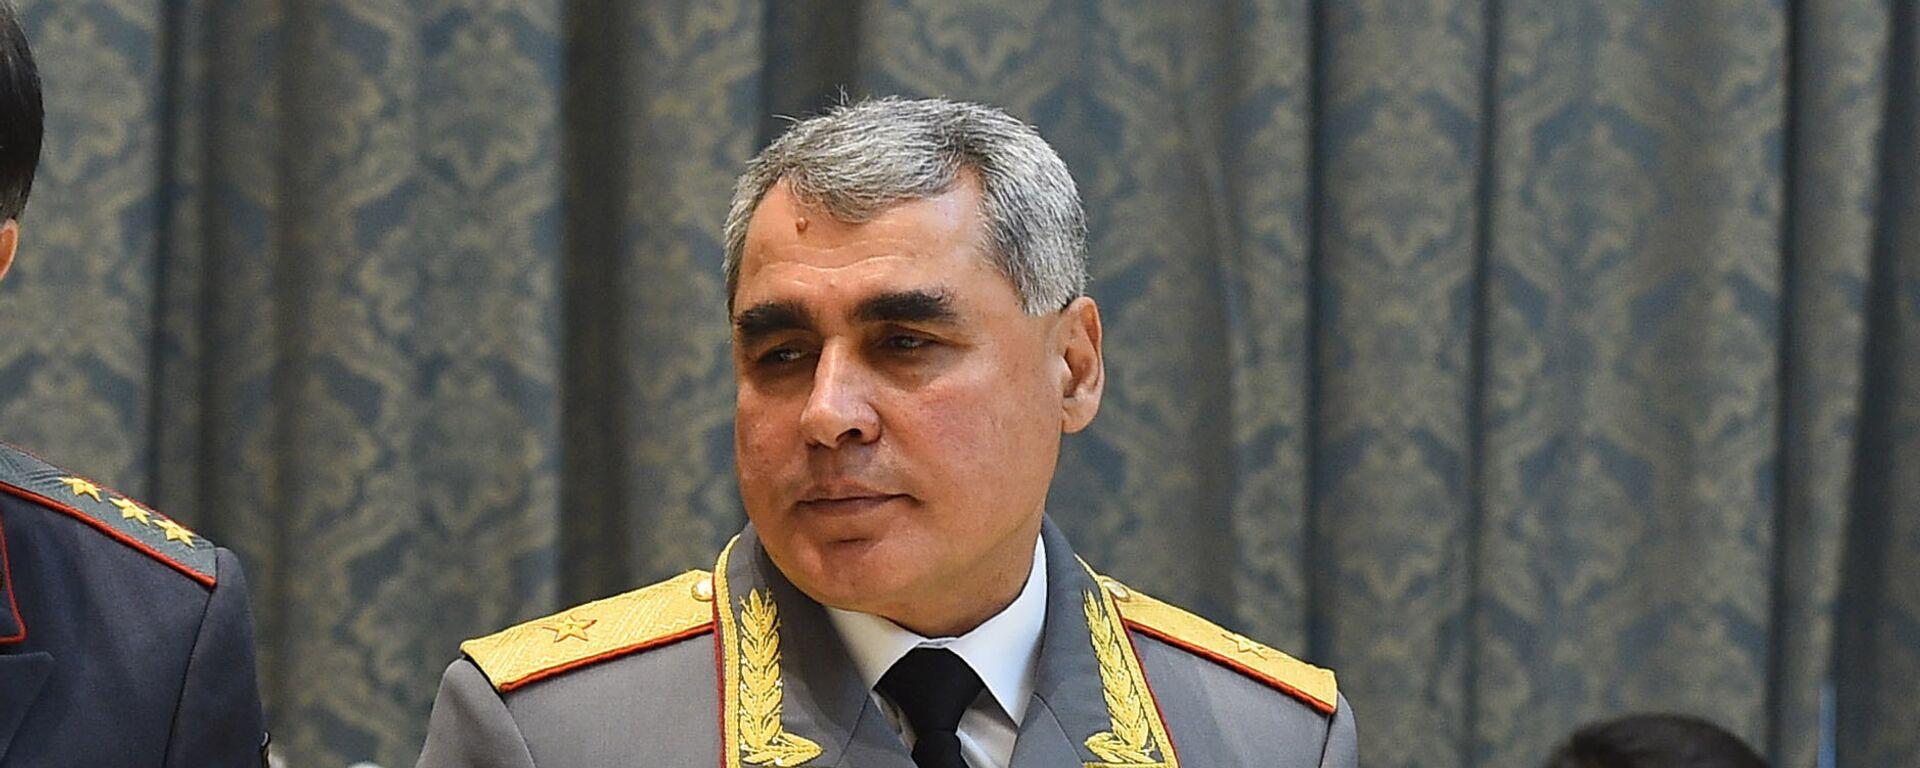 Генерал-майор милиции Шариф Назарзода - Sputnik Тоҷикистон, 1920, 13.07.2021